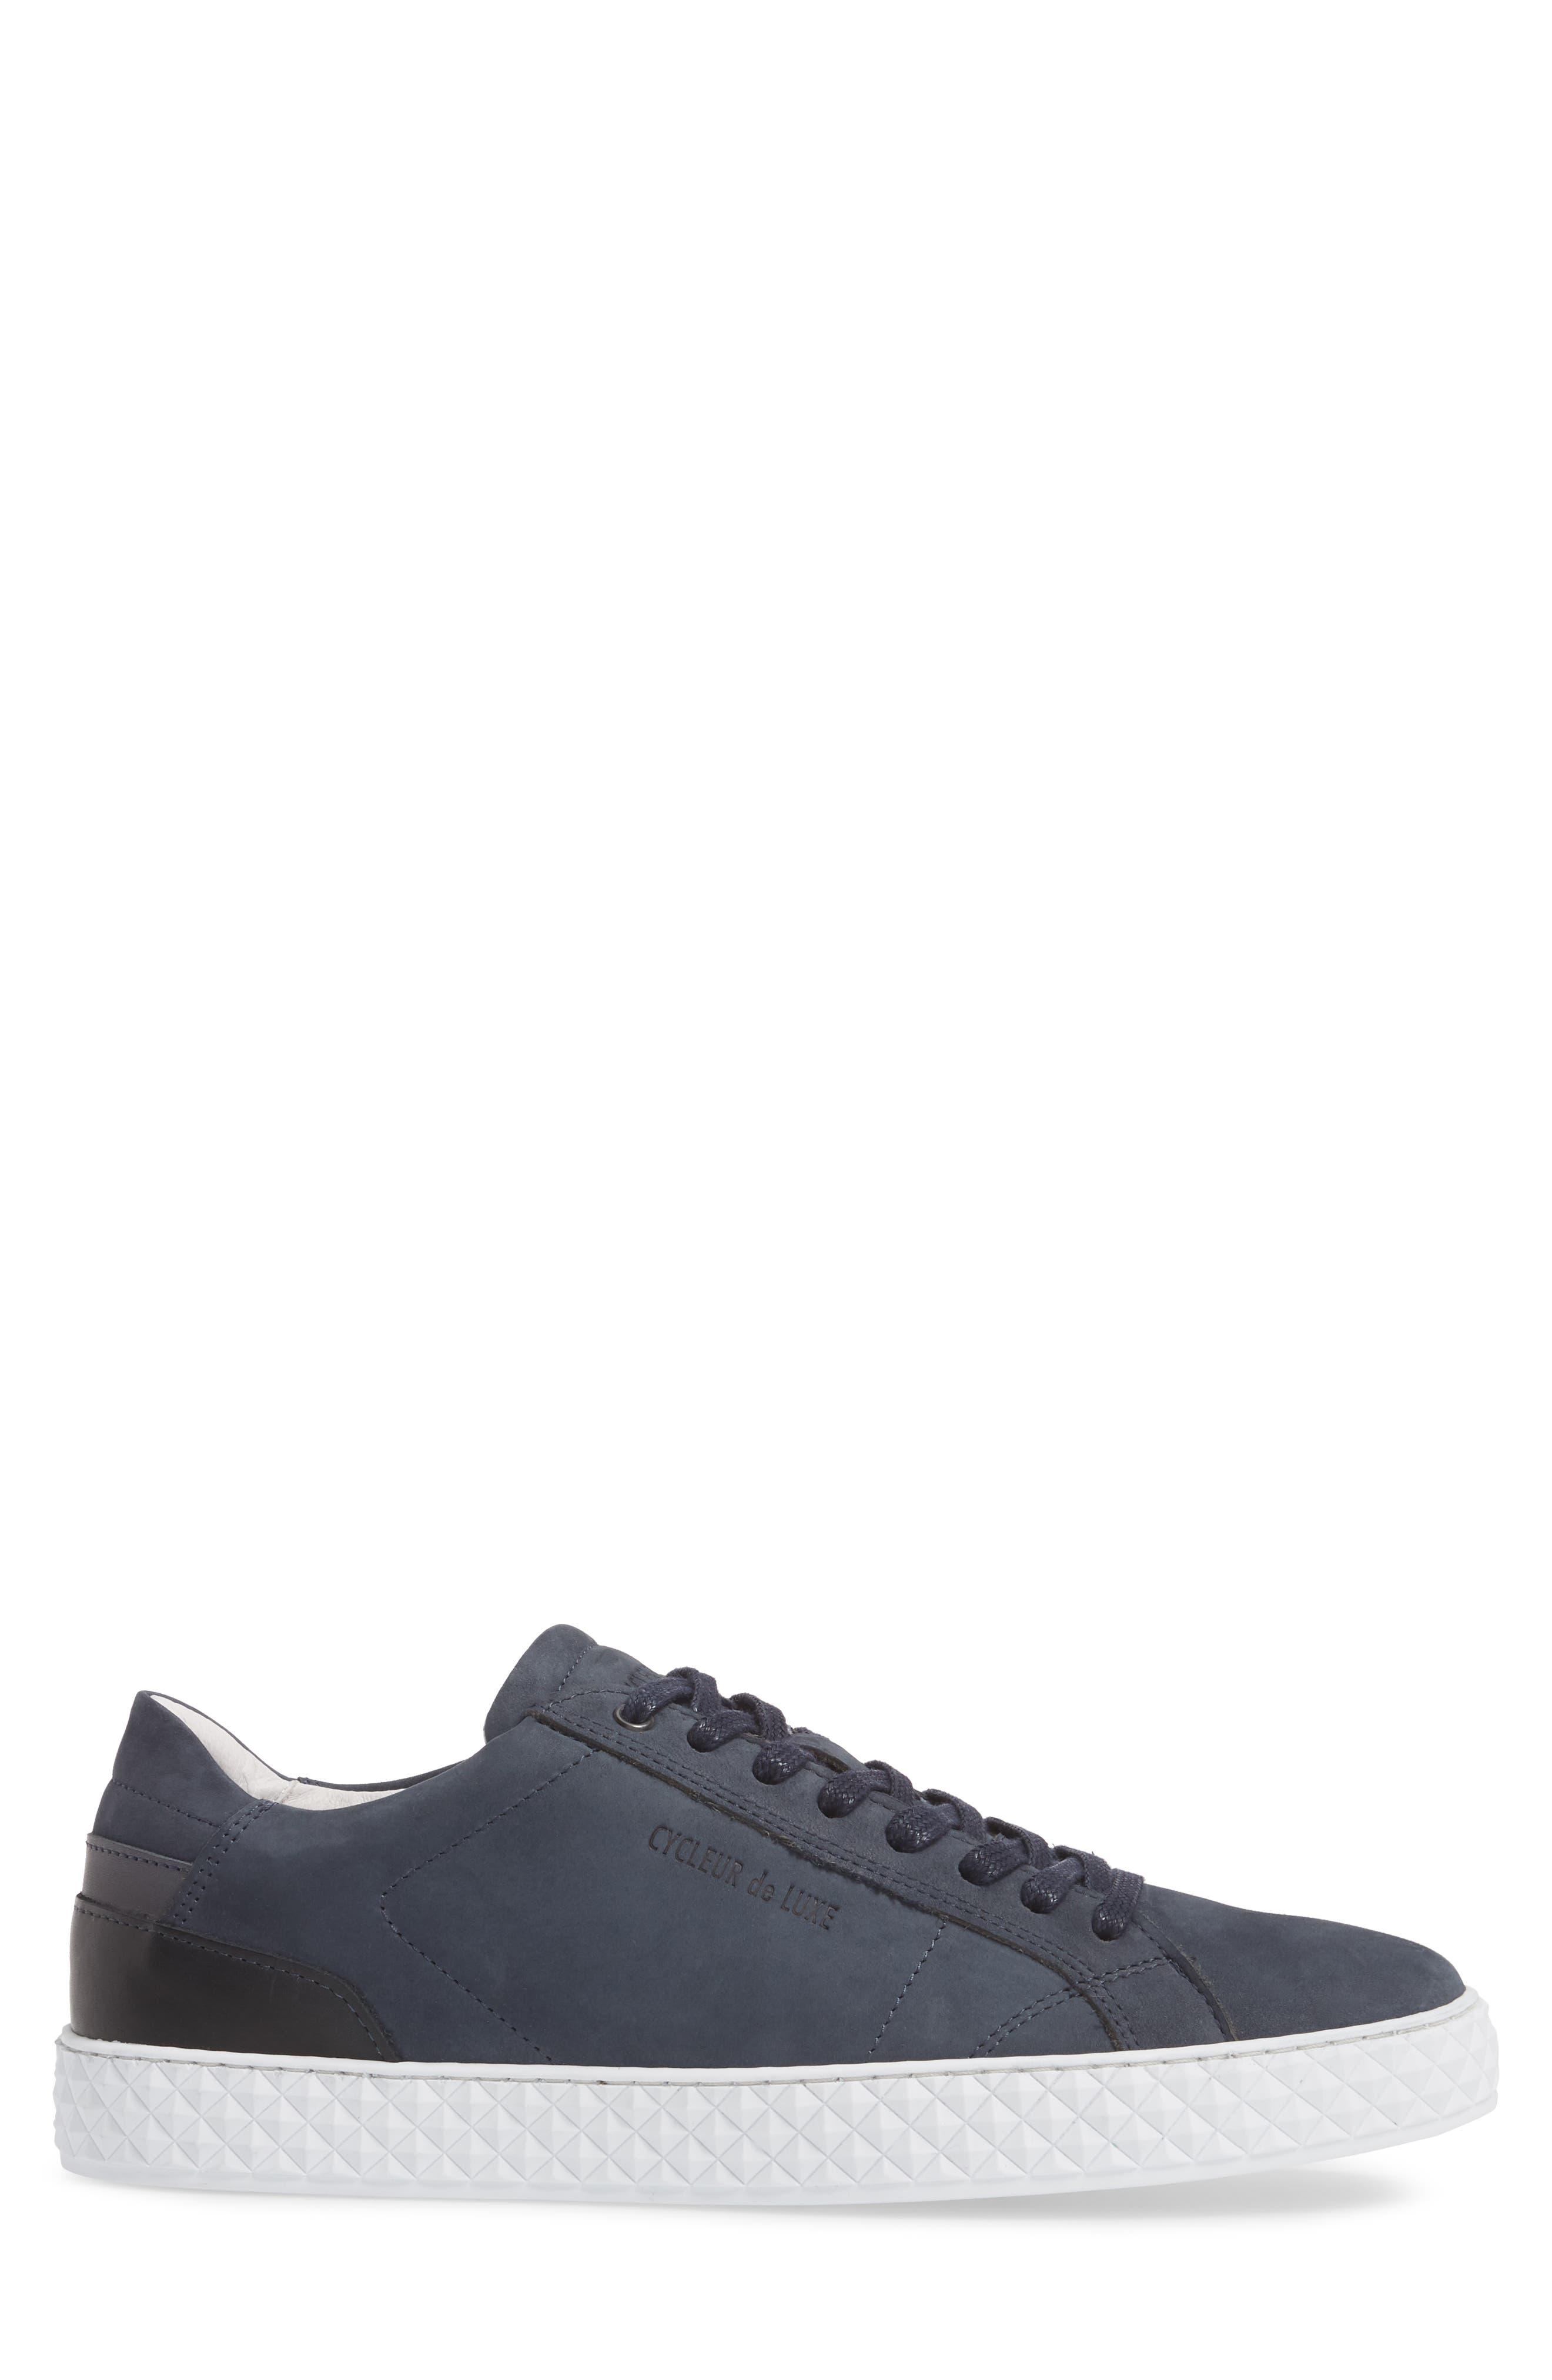 Bratislava Low Top Sneaker,                             Alternate thumbnail 3, color,                             Navy Leather